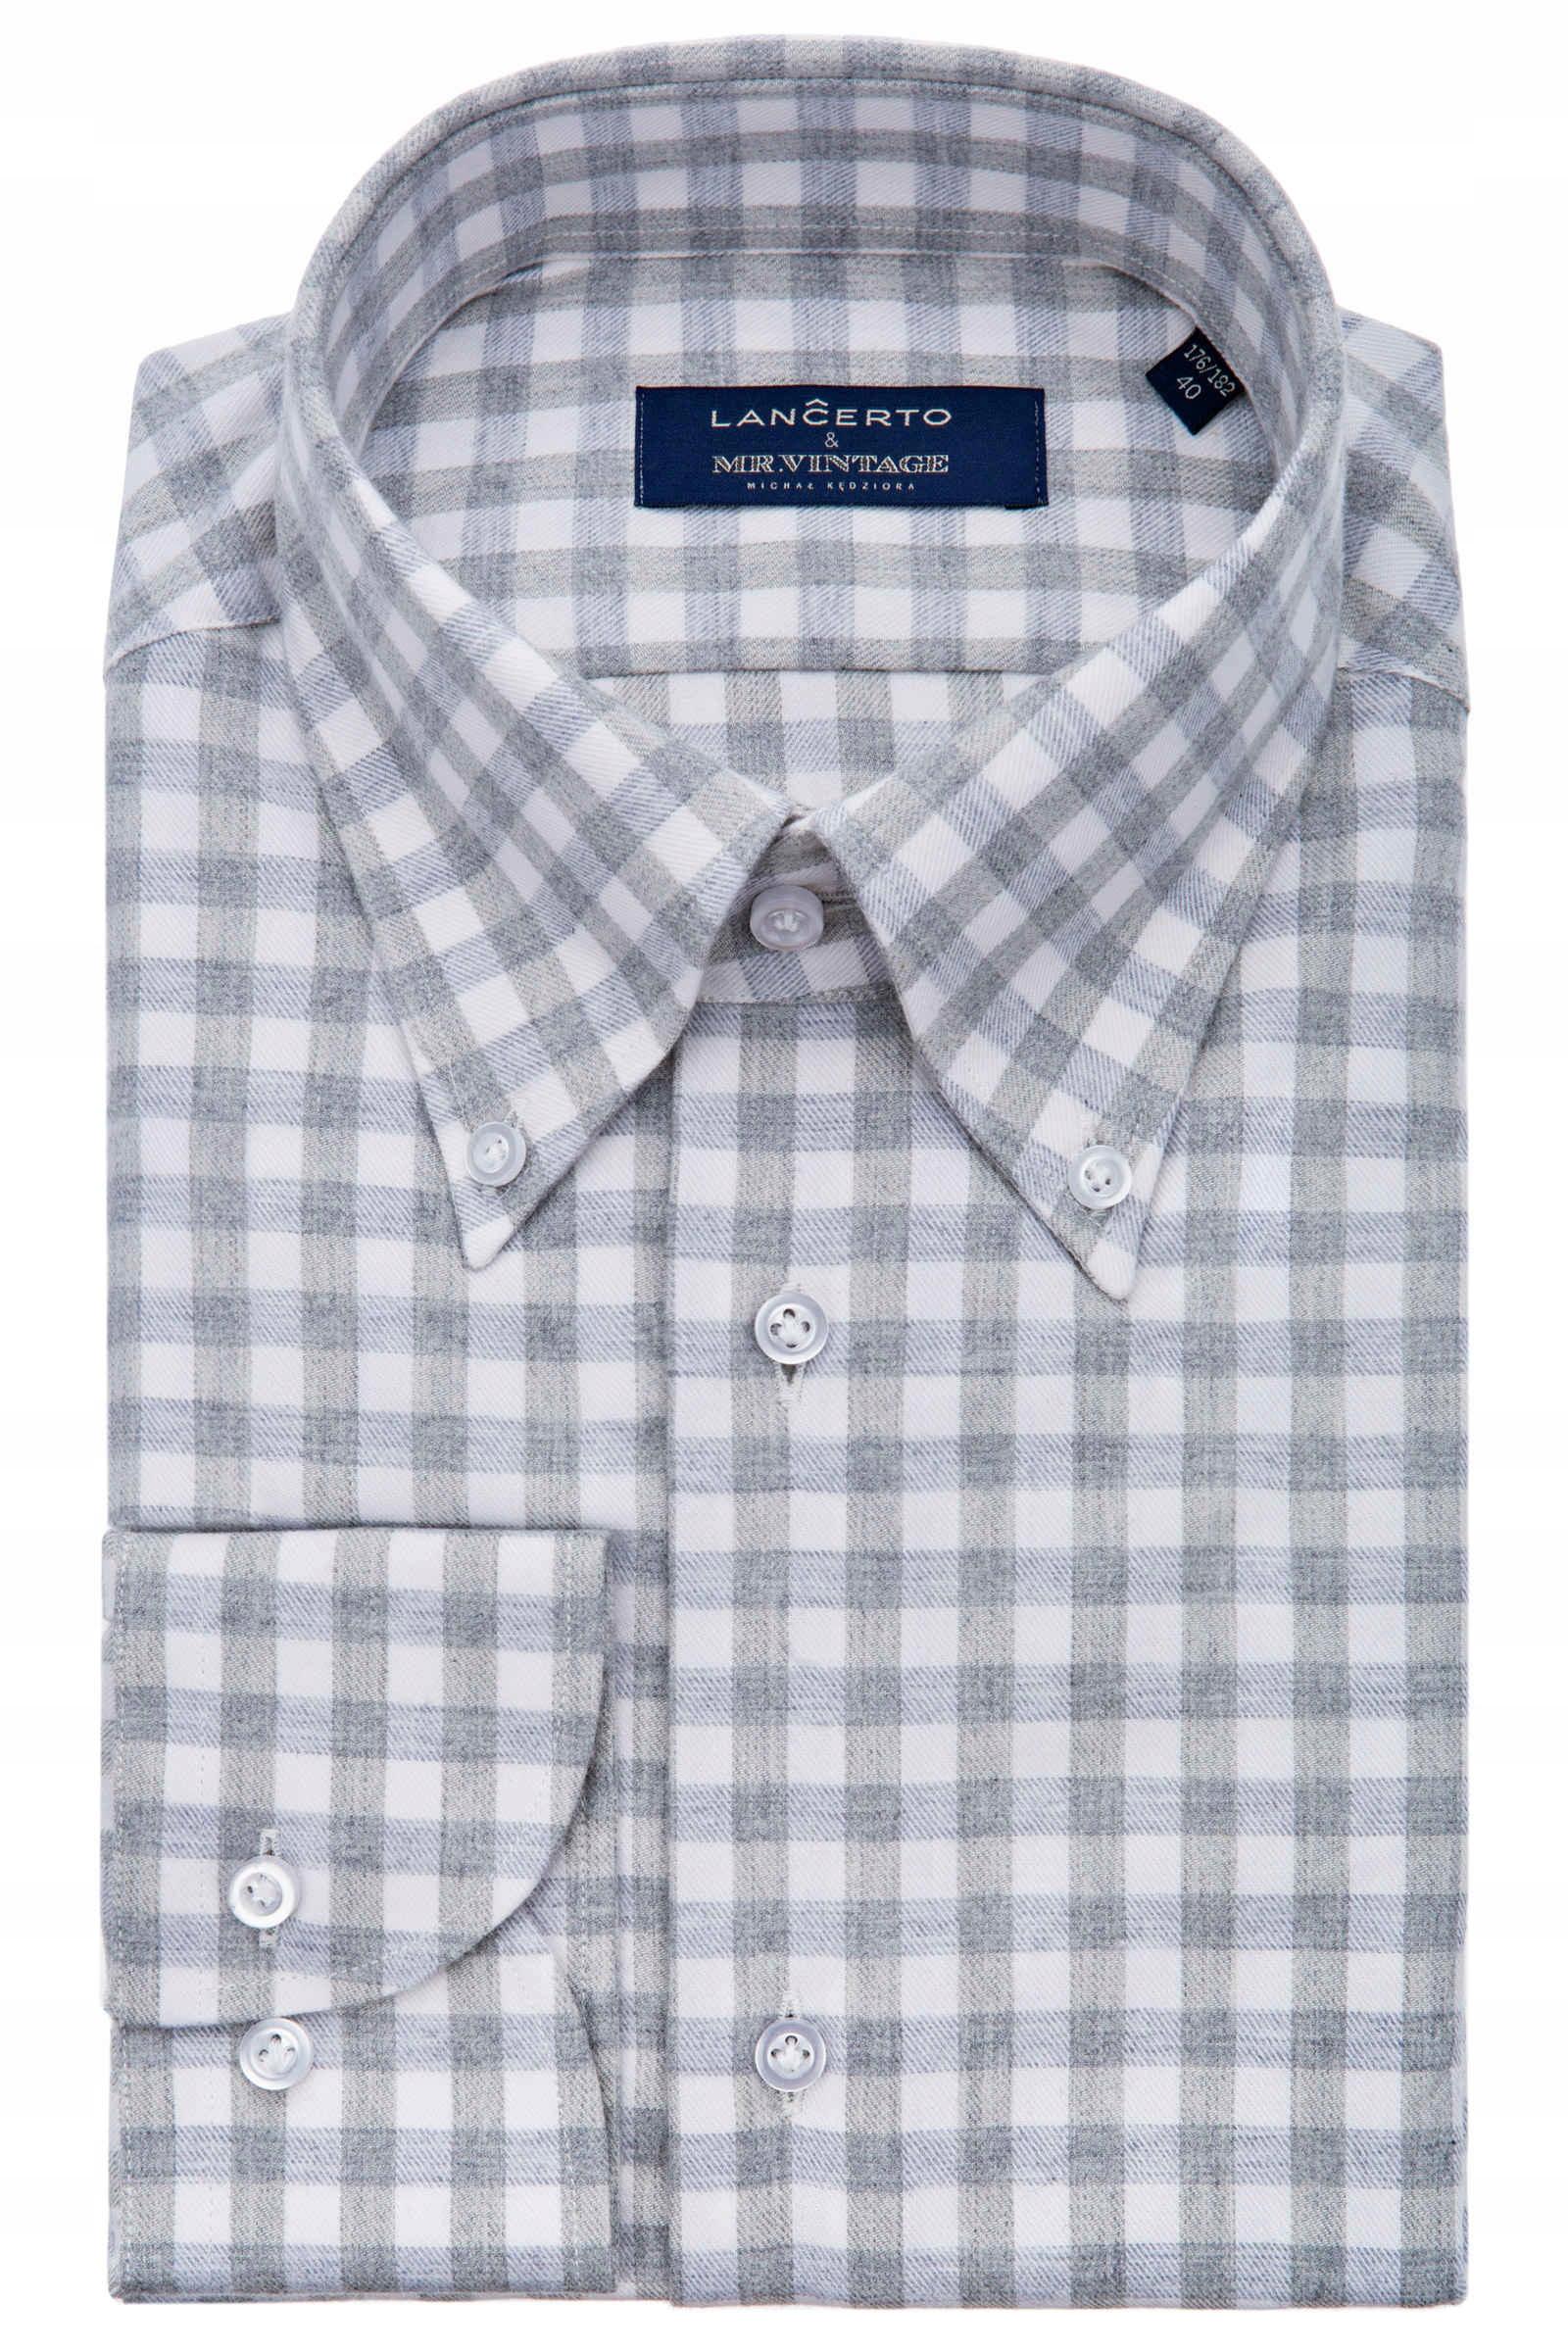 Lancerto tričko&Pán Vintage Medway 176/41